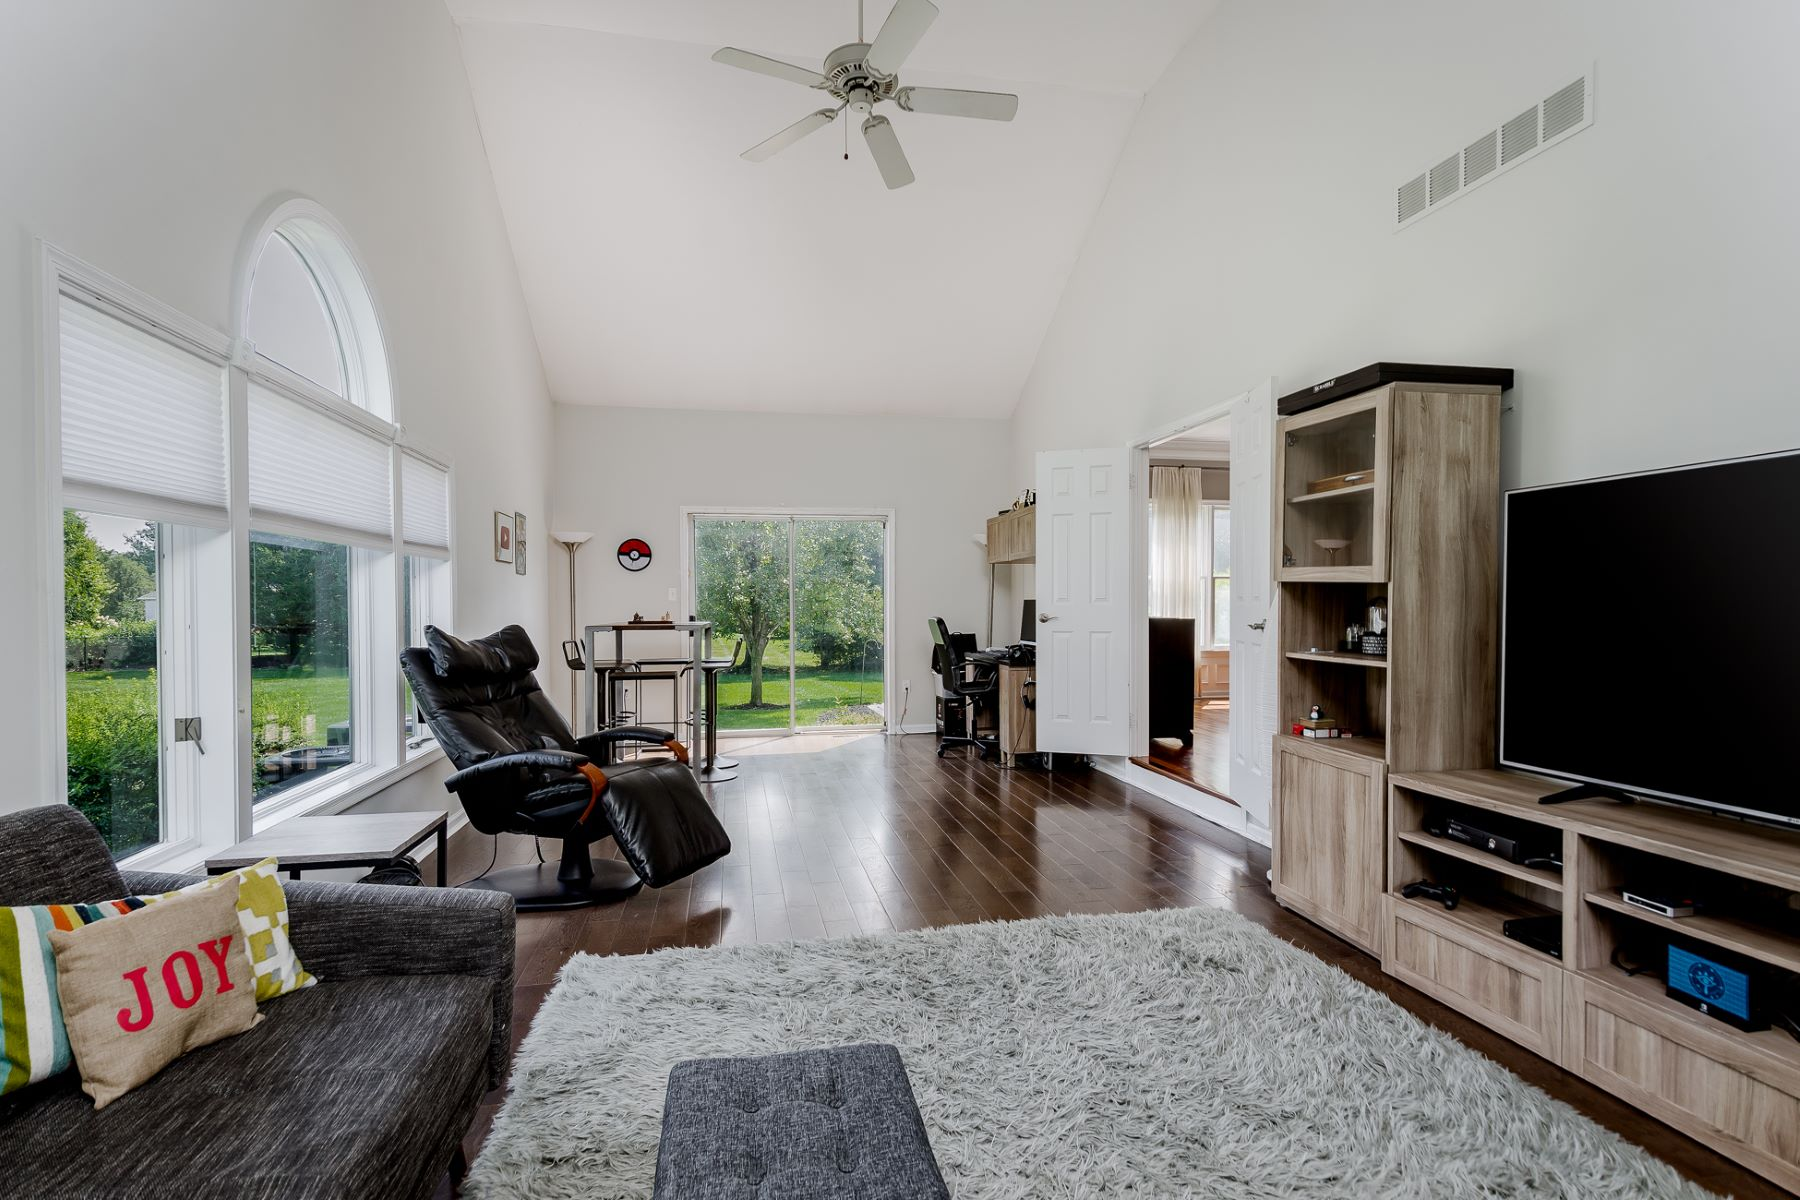 Additional photo for property listing at A Fresh Take on Sophistication 40 Reed Drive South, West Windsor, Νιου Τζερσεϋ 08550 Ηνωμένες Πολιτείες